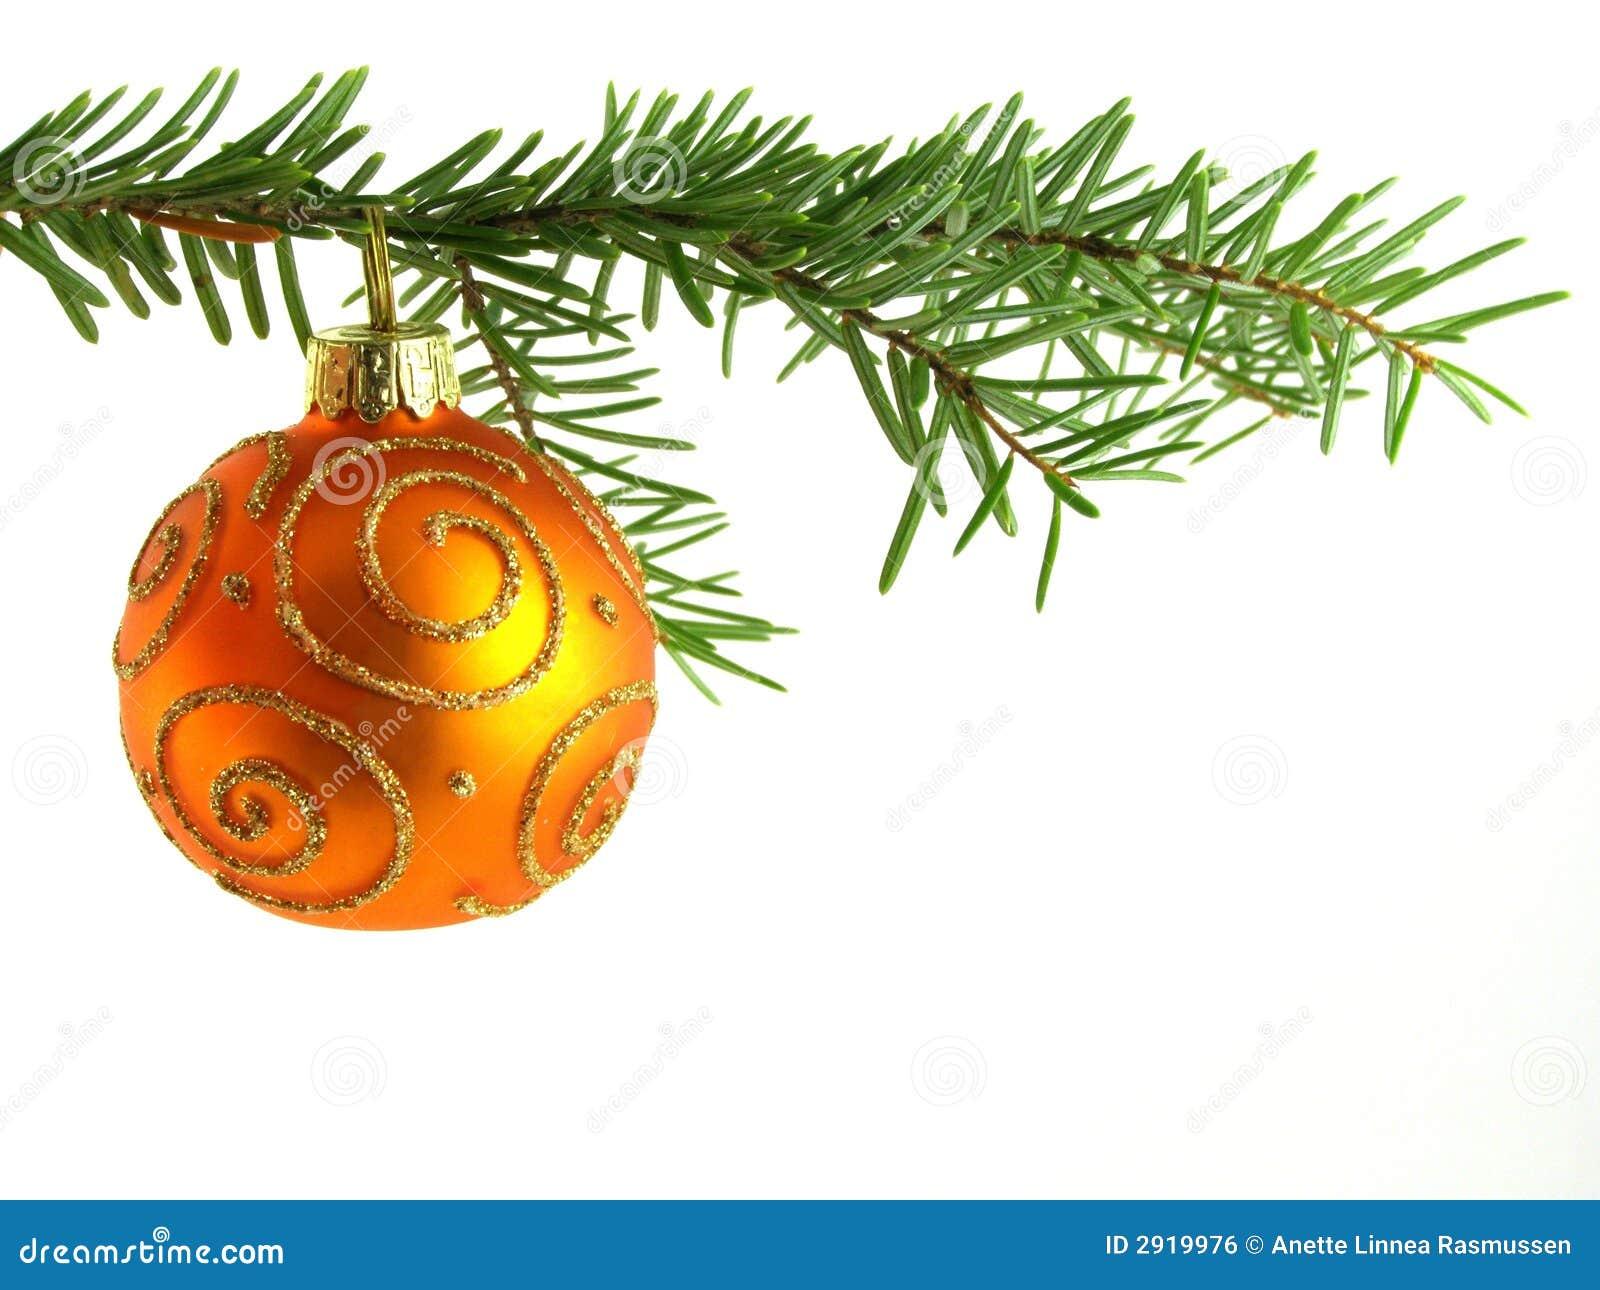 Orange Christmas Bauble Stock Photo. Image Of Object, Ball